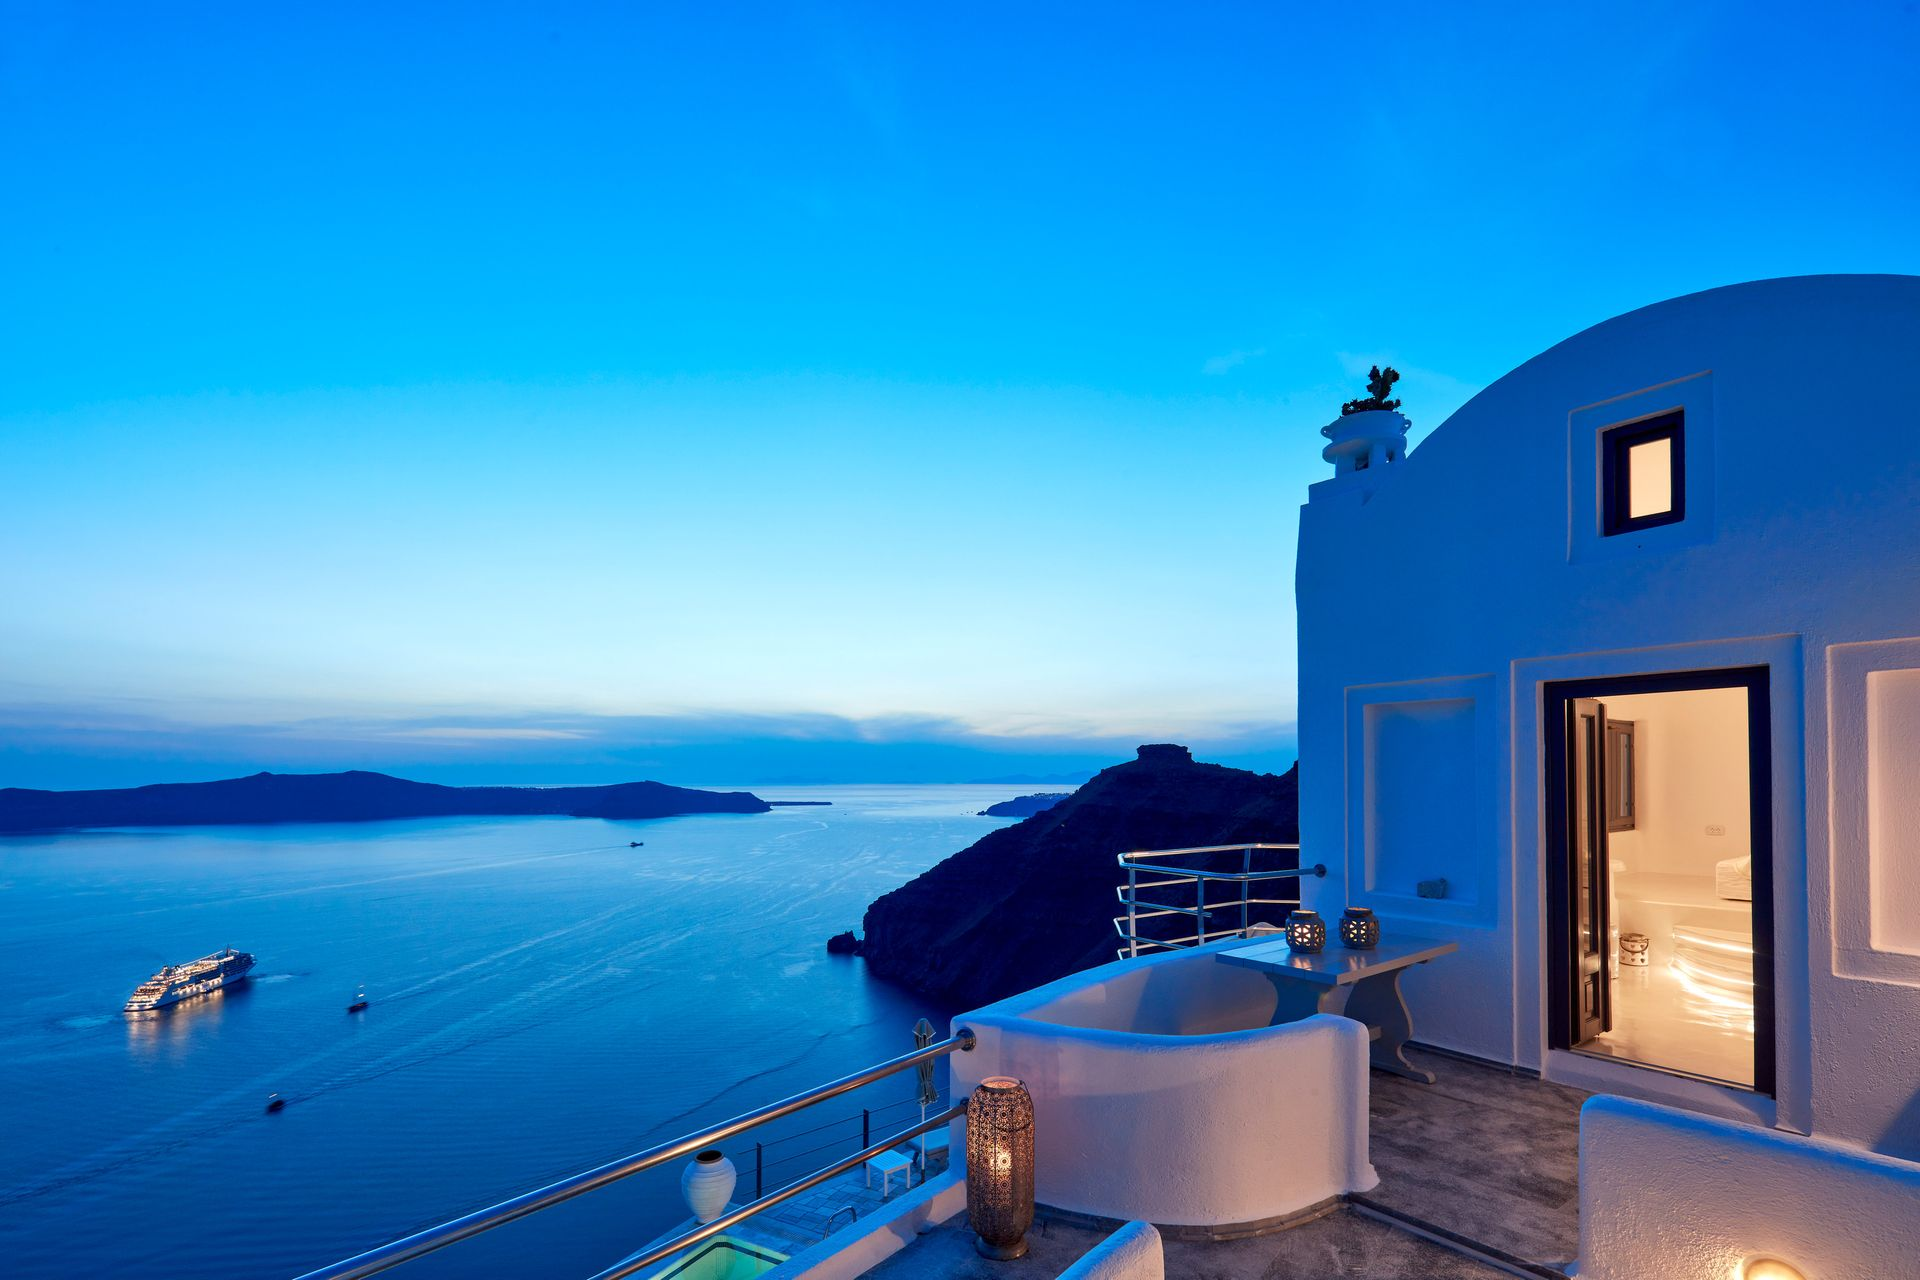 Homeric Poems Santorini - Σαντορίνη ✦ 2 Ημέρες (1 Διανυκτέρευση) ✦ 2 άτομα ✦ Πρωινό ✦ 01/06/2021 έως 30/09/2021 ✦ Μοναδική θέα!